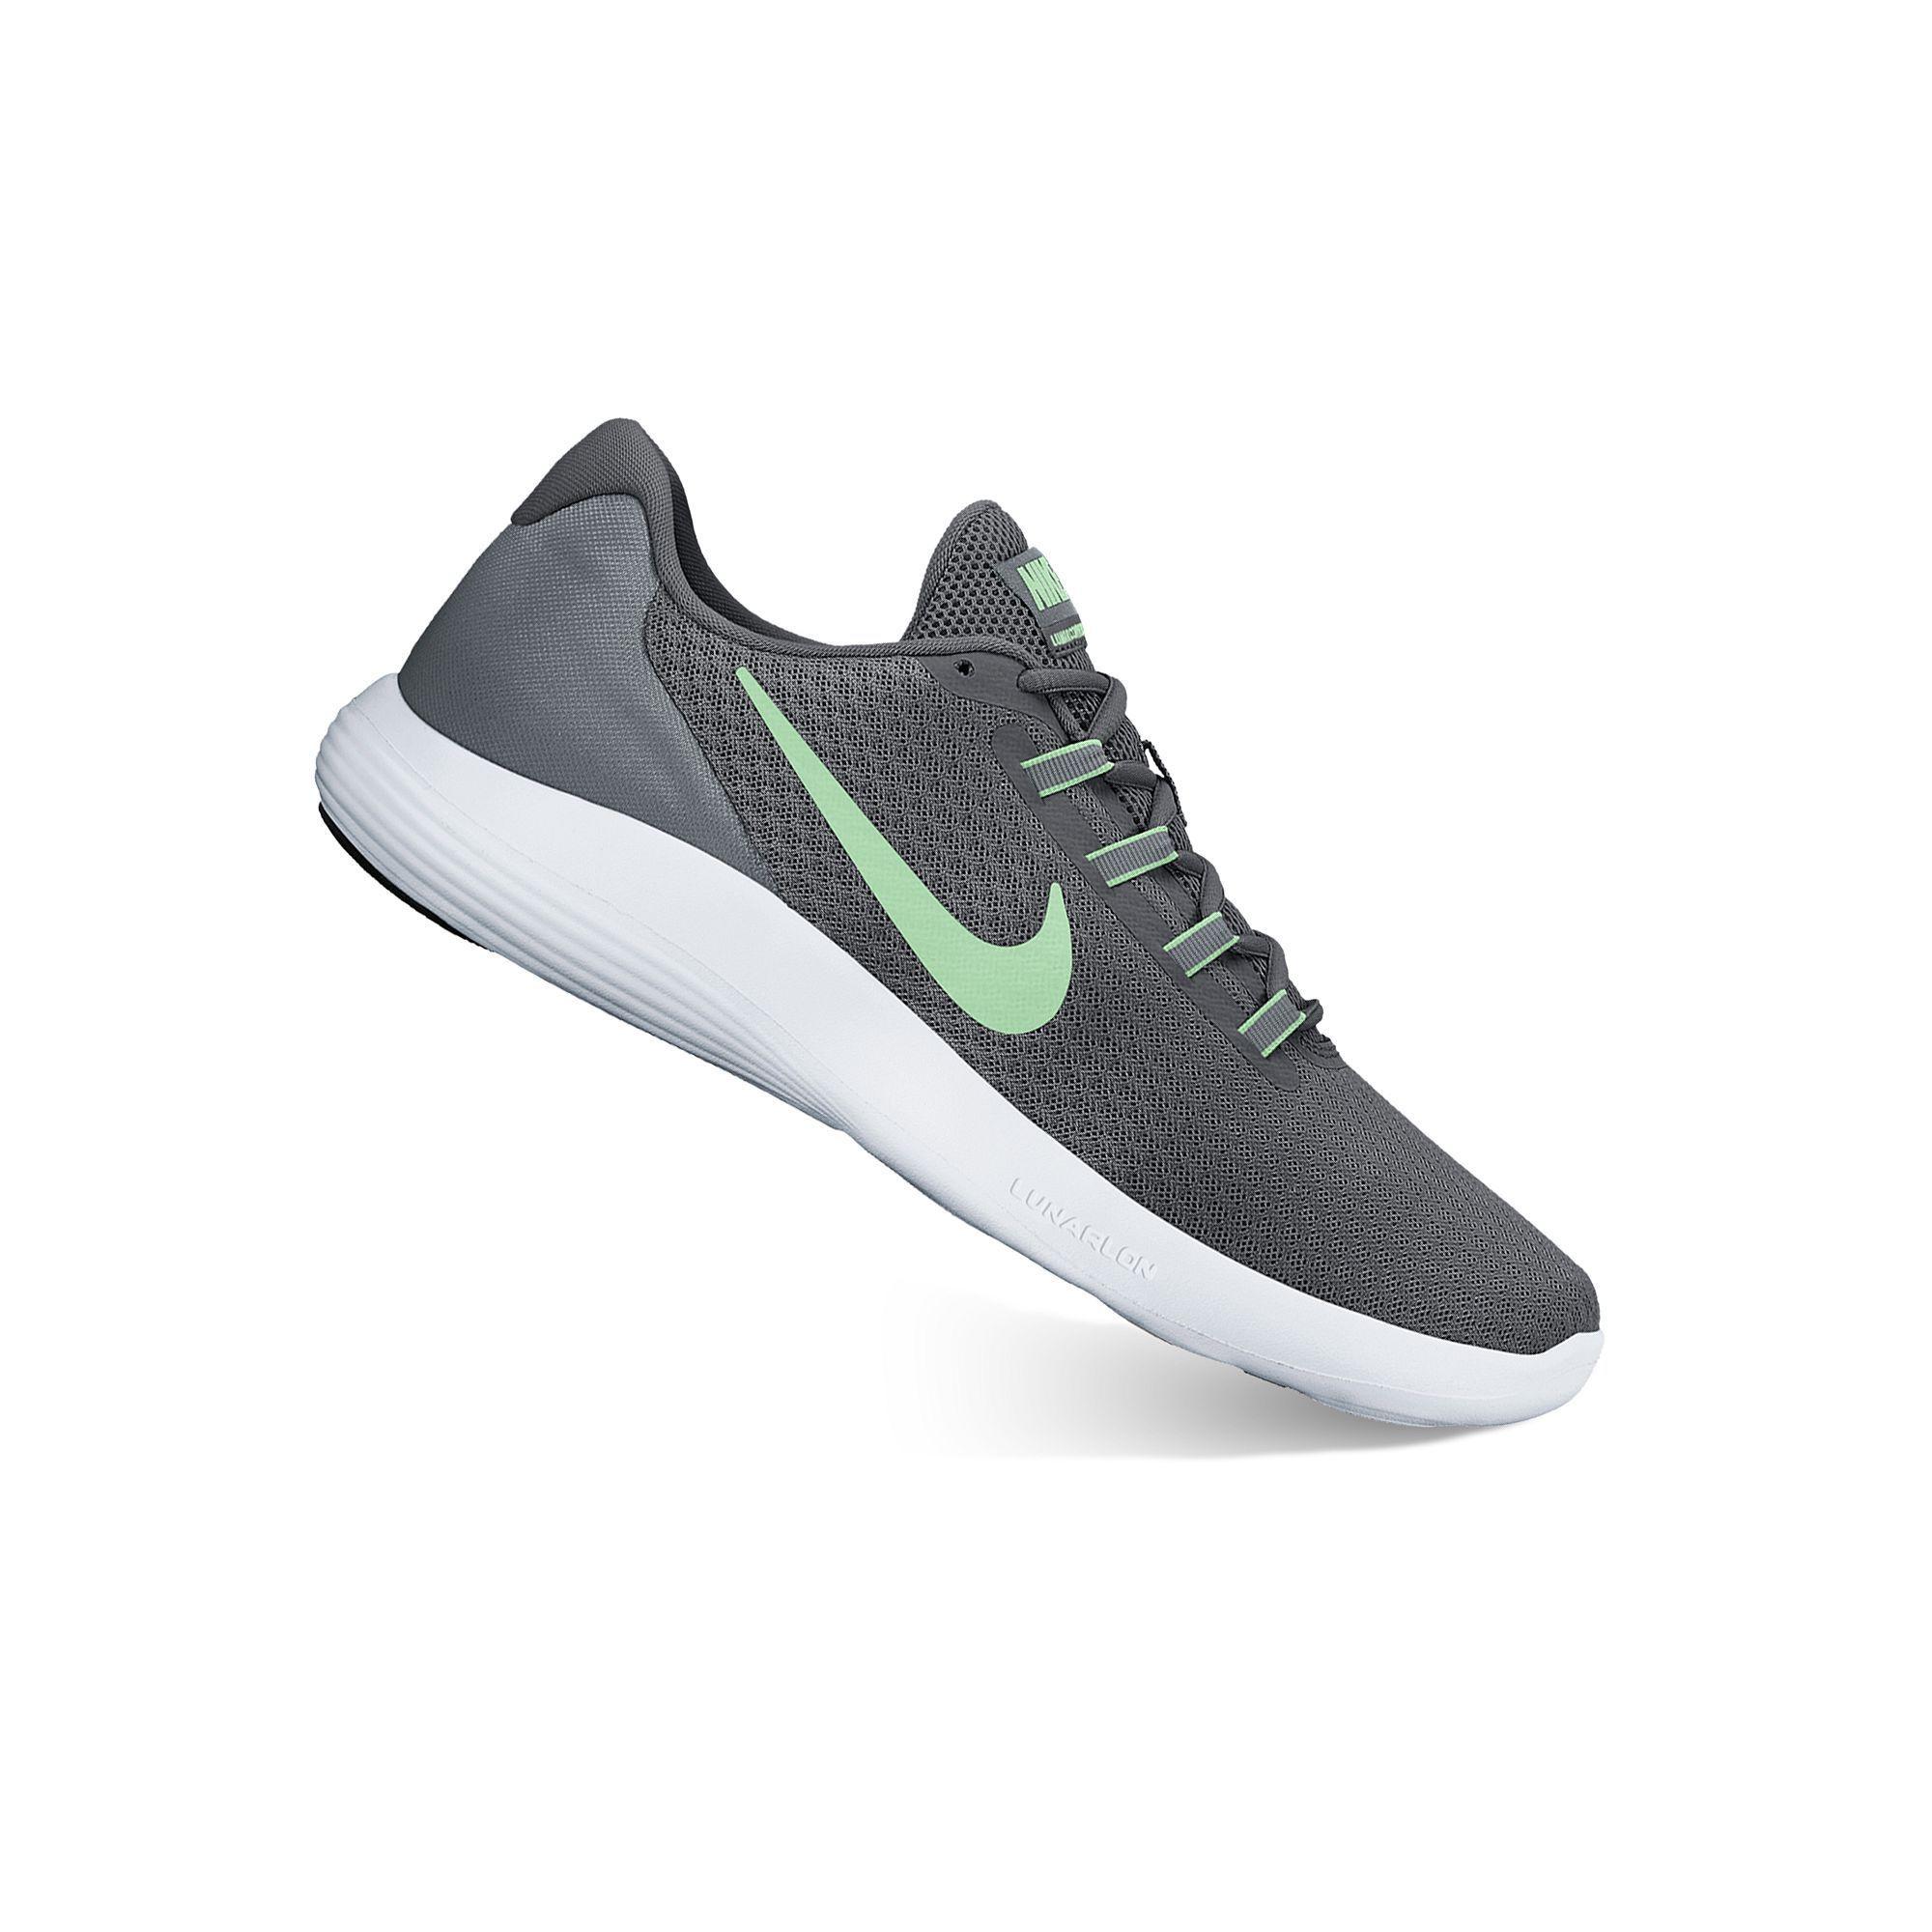 aefff44a598 Nike LunarConverge Women s Running Shoes